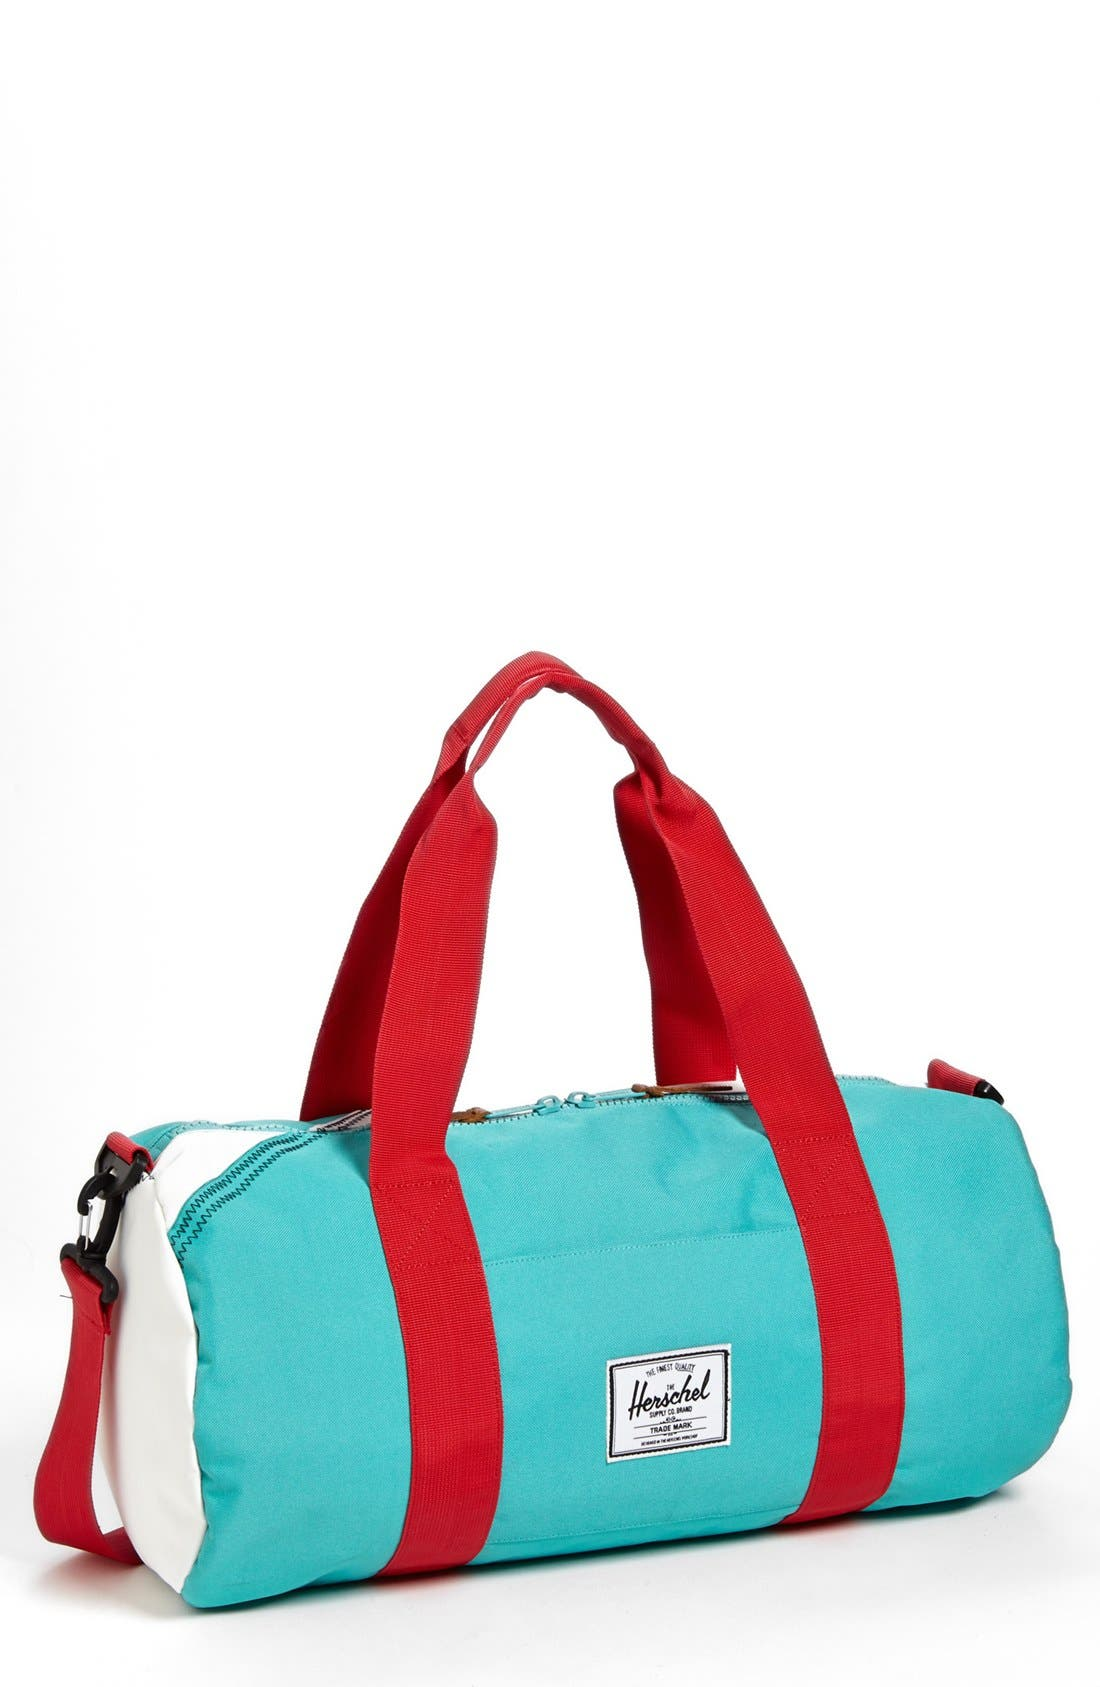 Main Image - Herschel Supply Co. 'Sutton - Studio Collection' Mid Size Duffel Bag